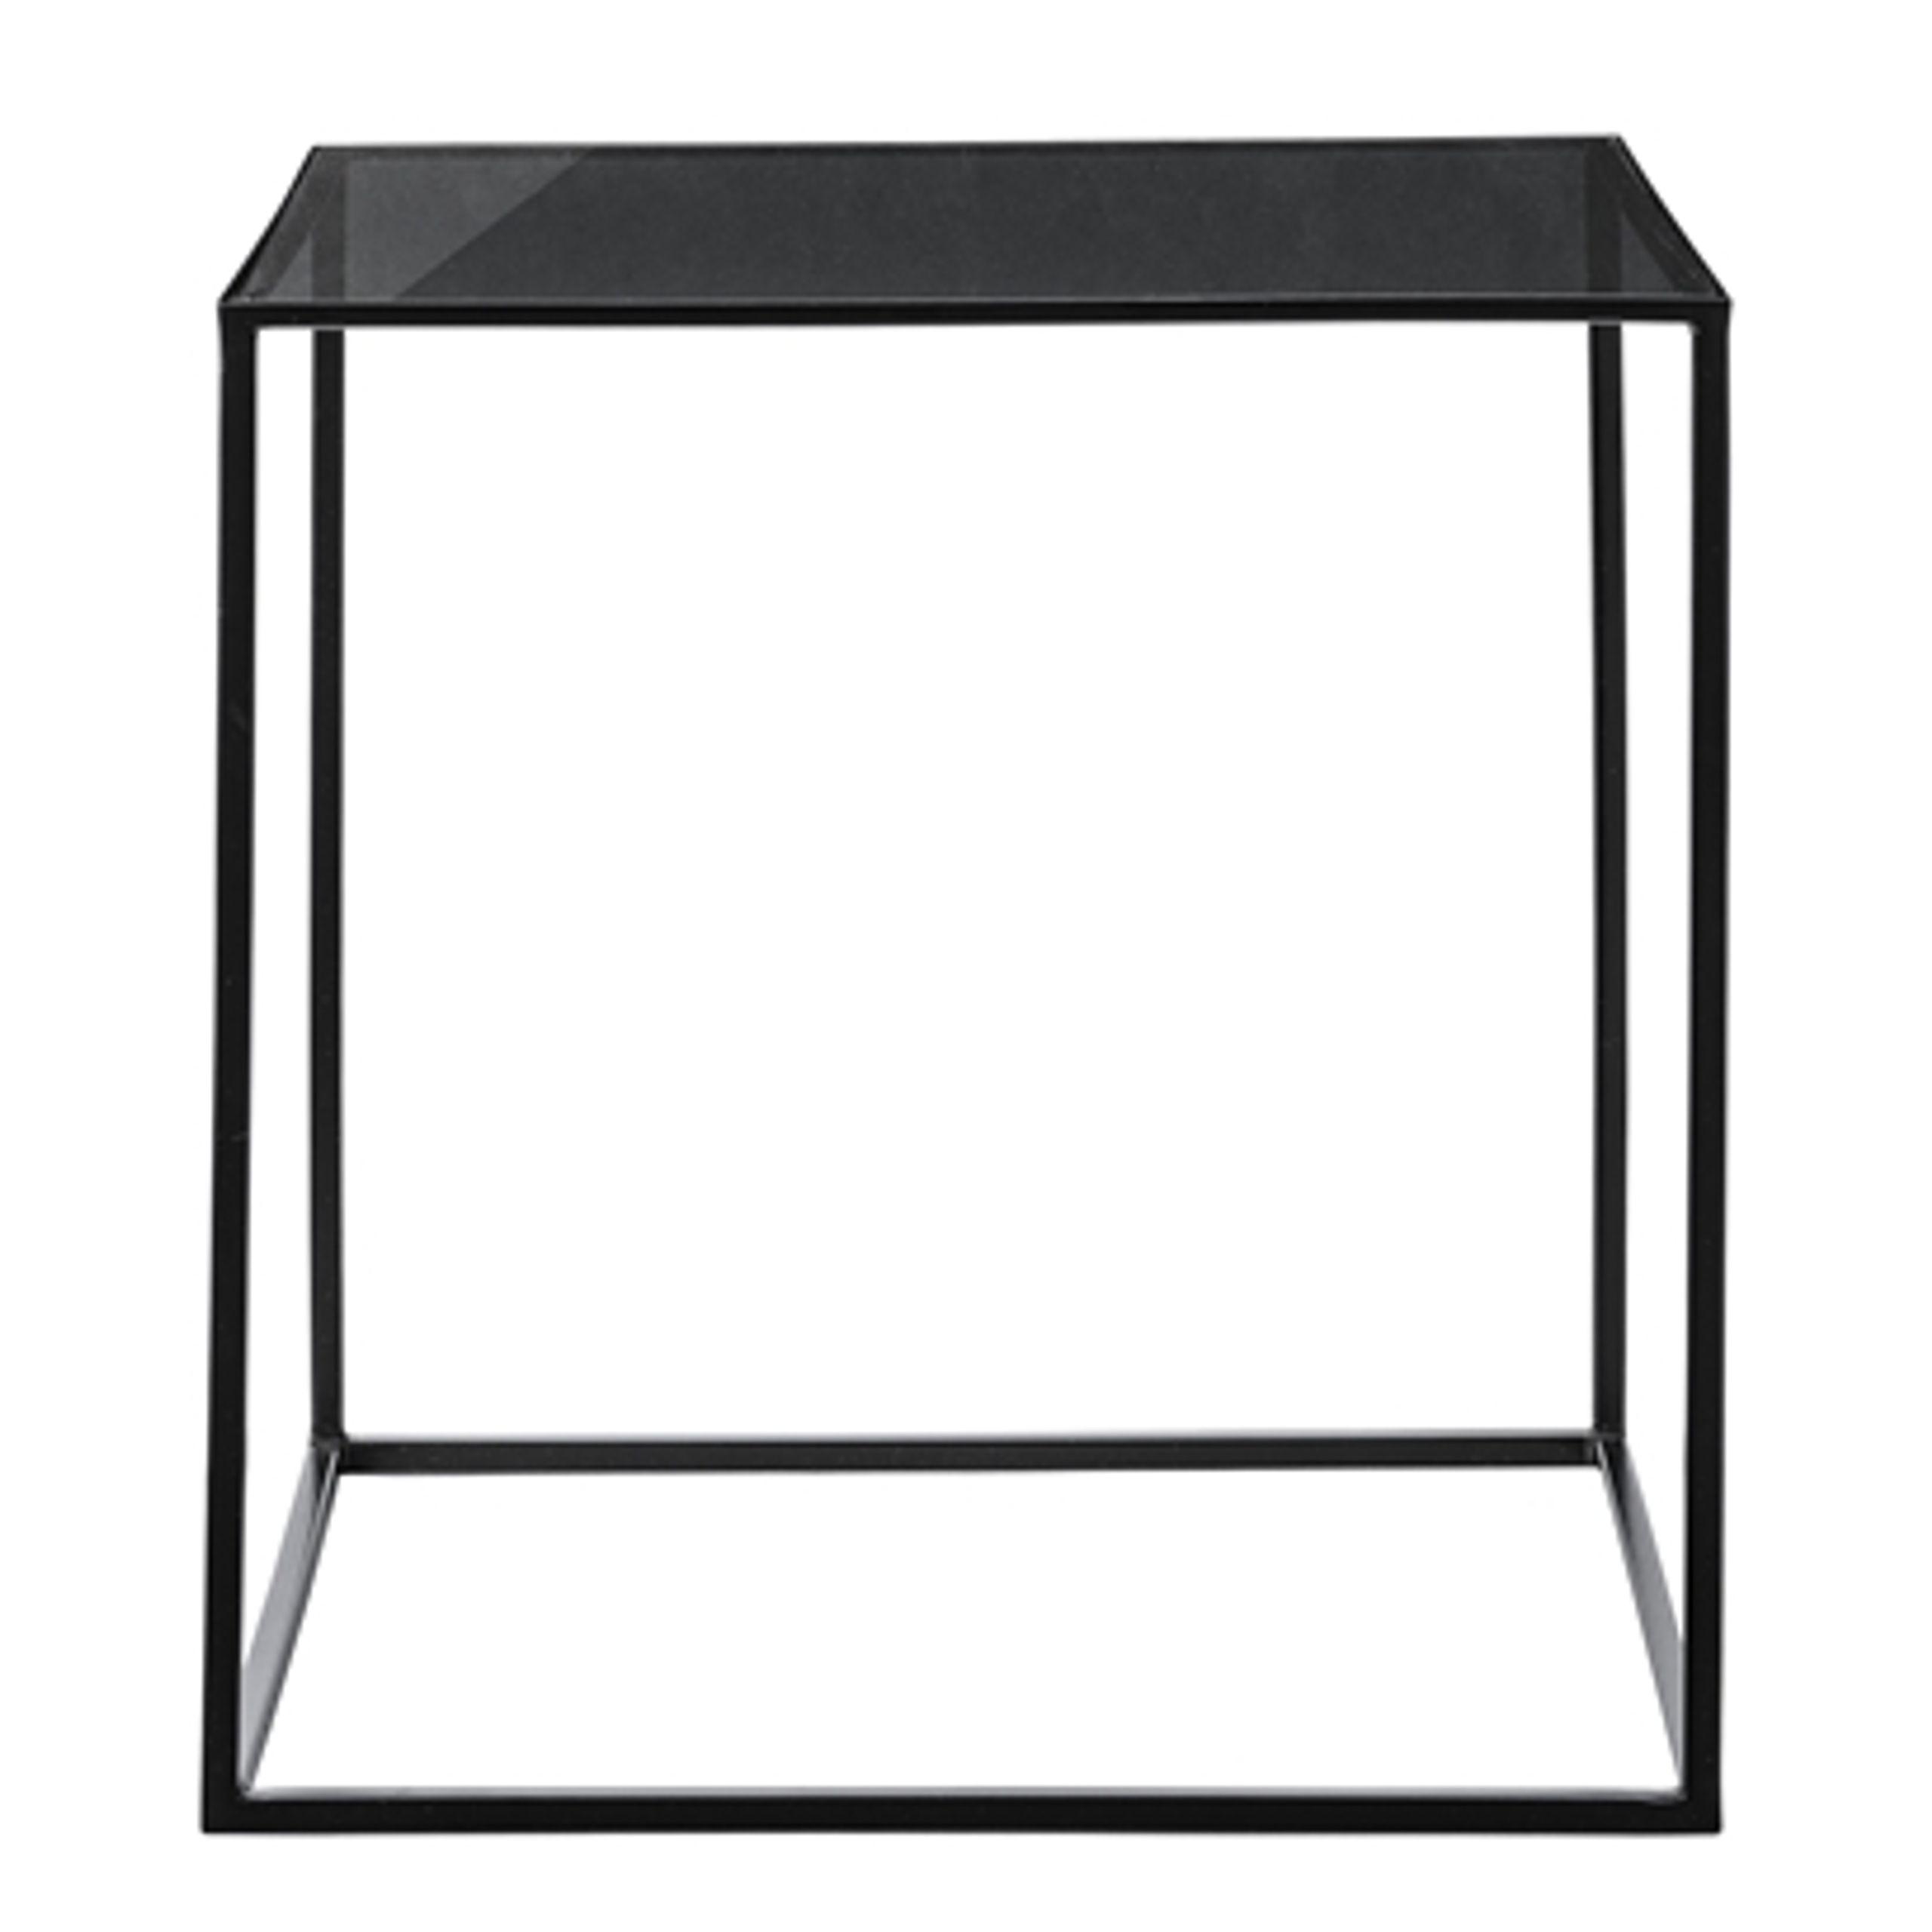 Cube Sidebord thumbnail